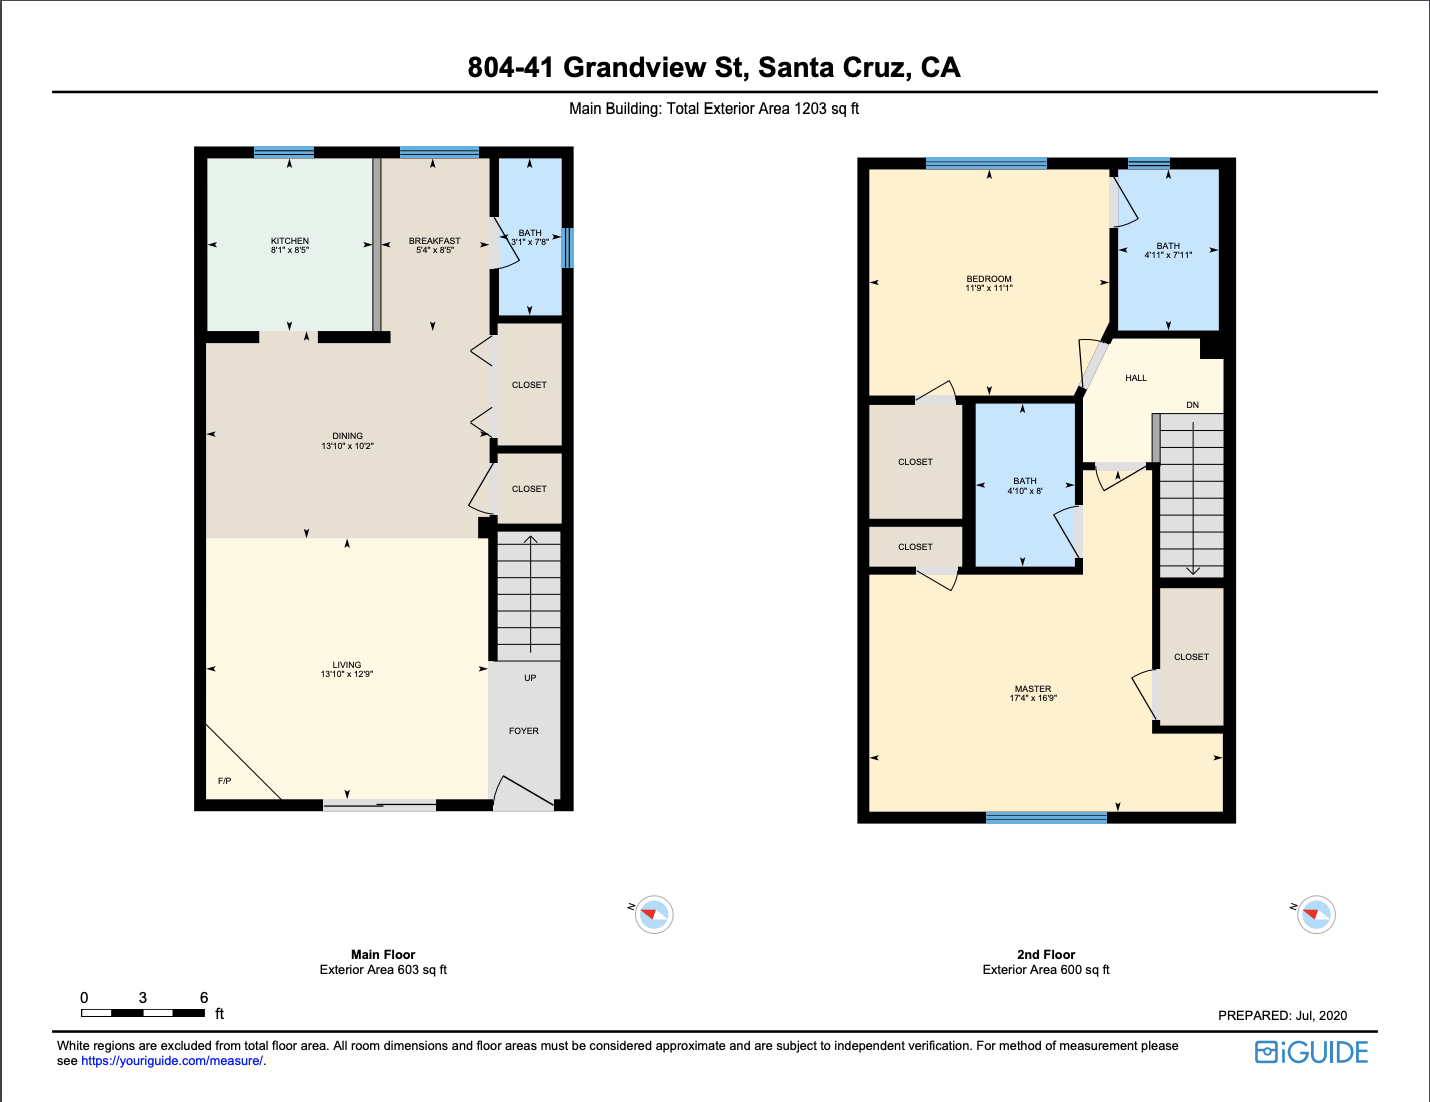 41 grandview 804 - main level floor plan